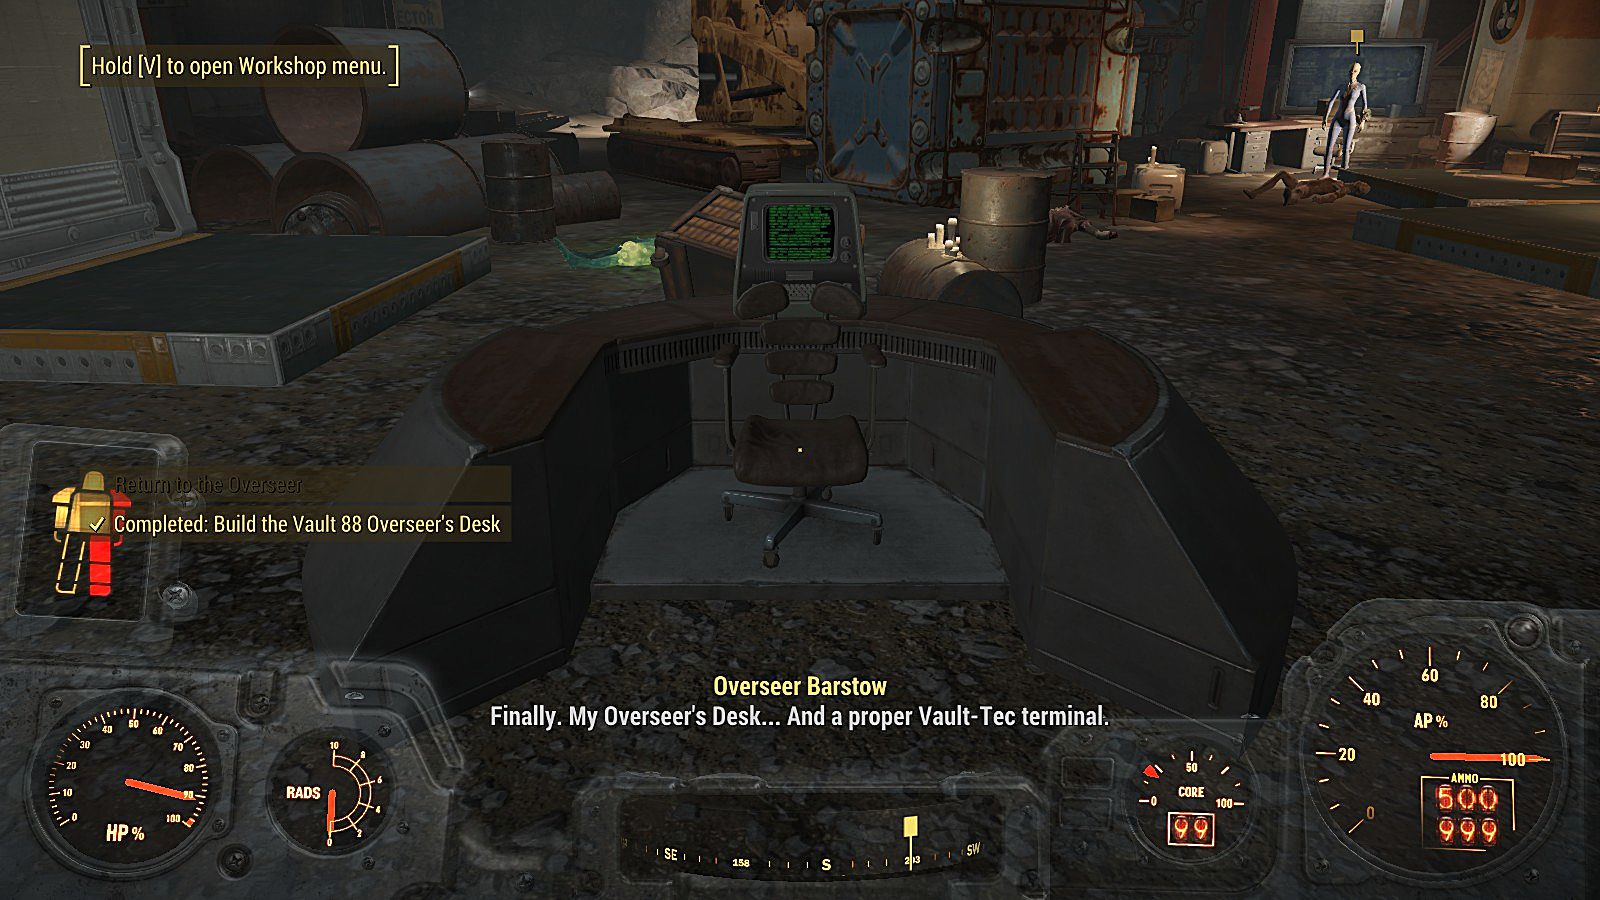 fallout 4 vault 88 quest